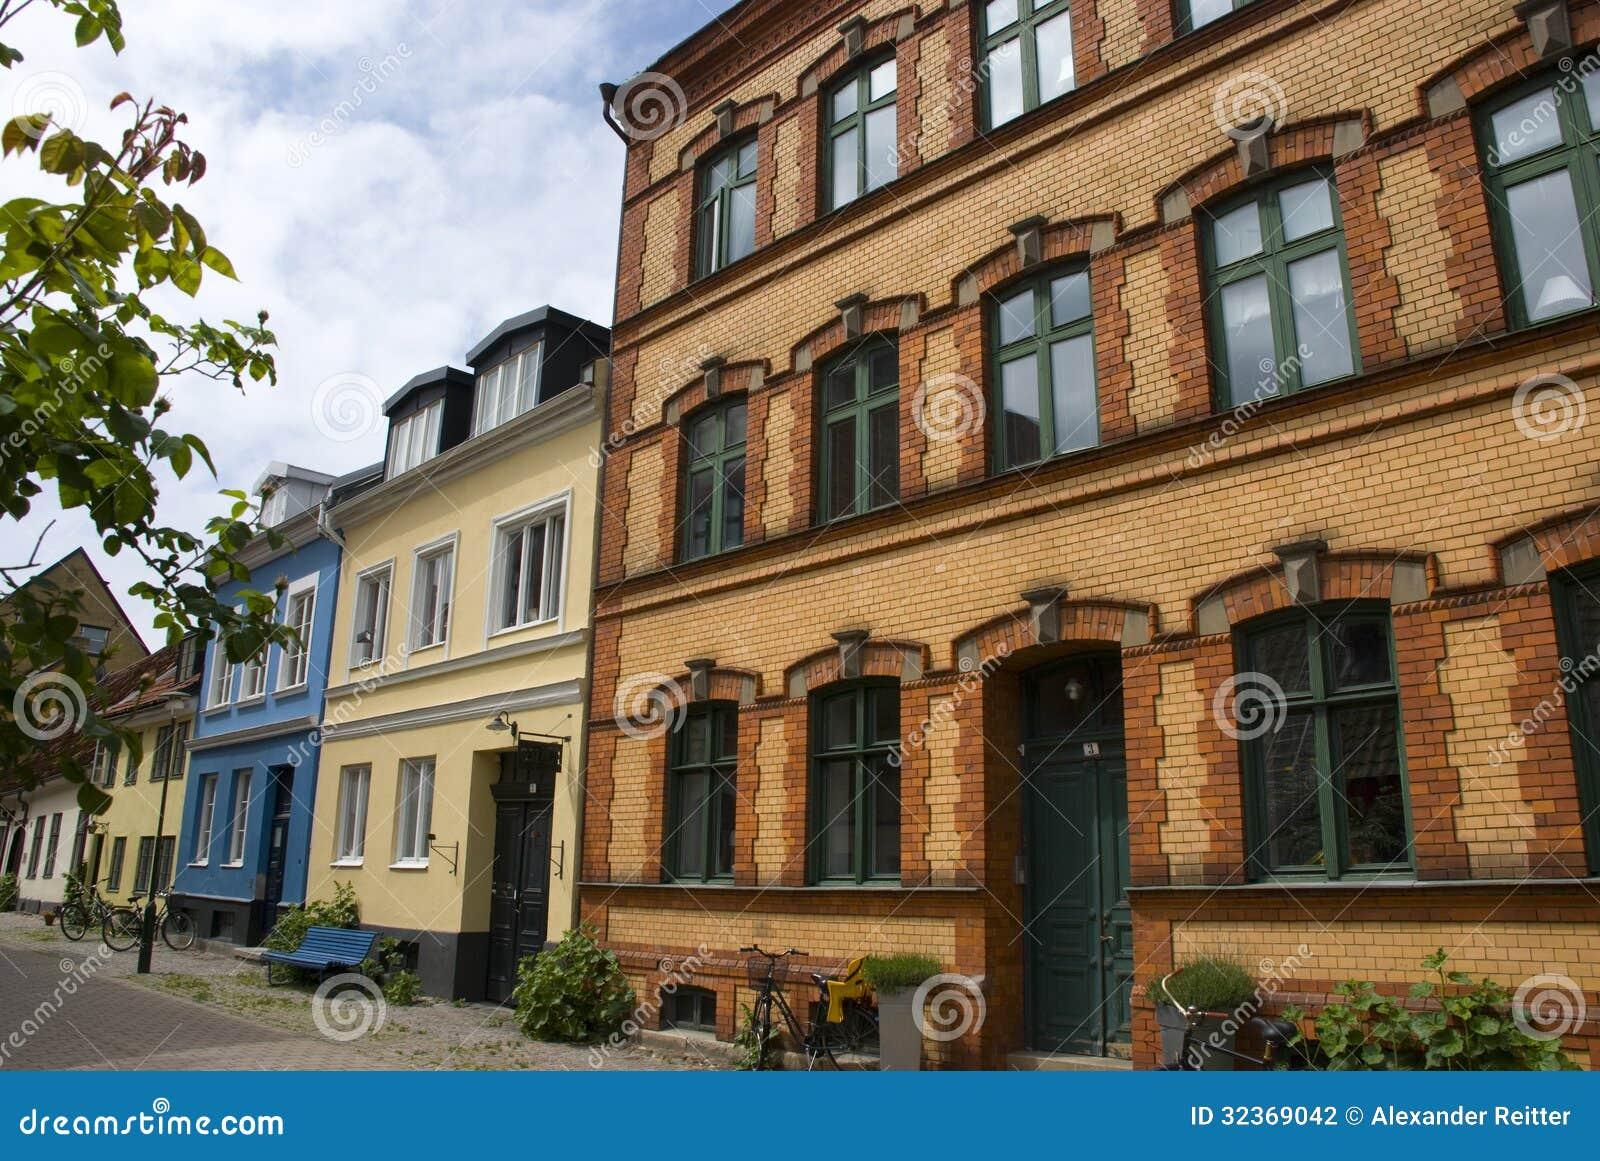 Fachadas de casas escandinavas coloridas fotografia de - Casas escandinavas ...